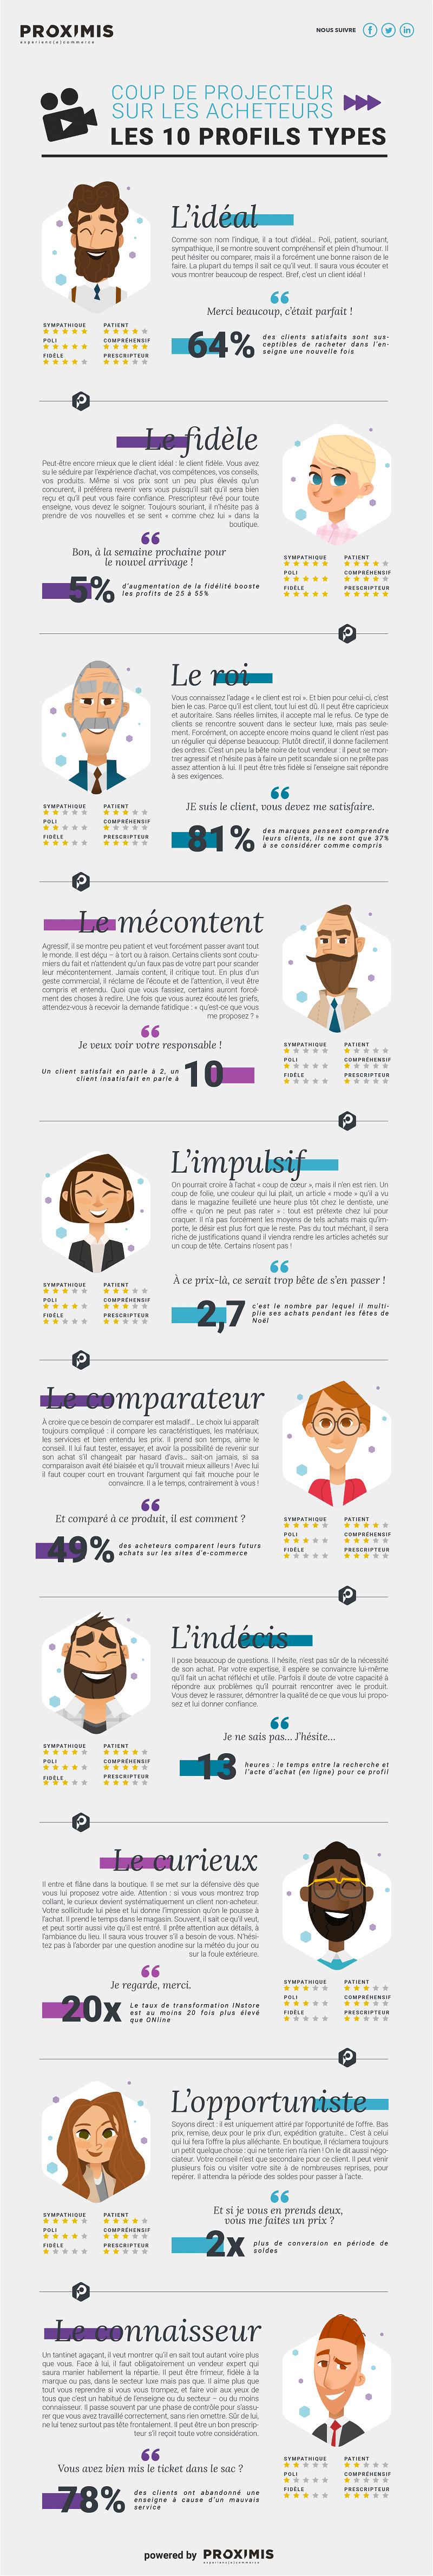 10 profils type d'acheteurs